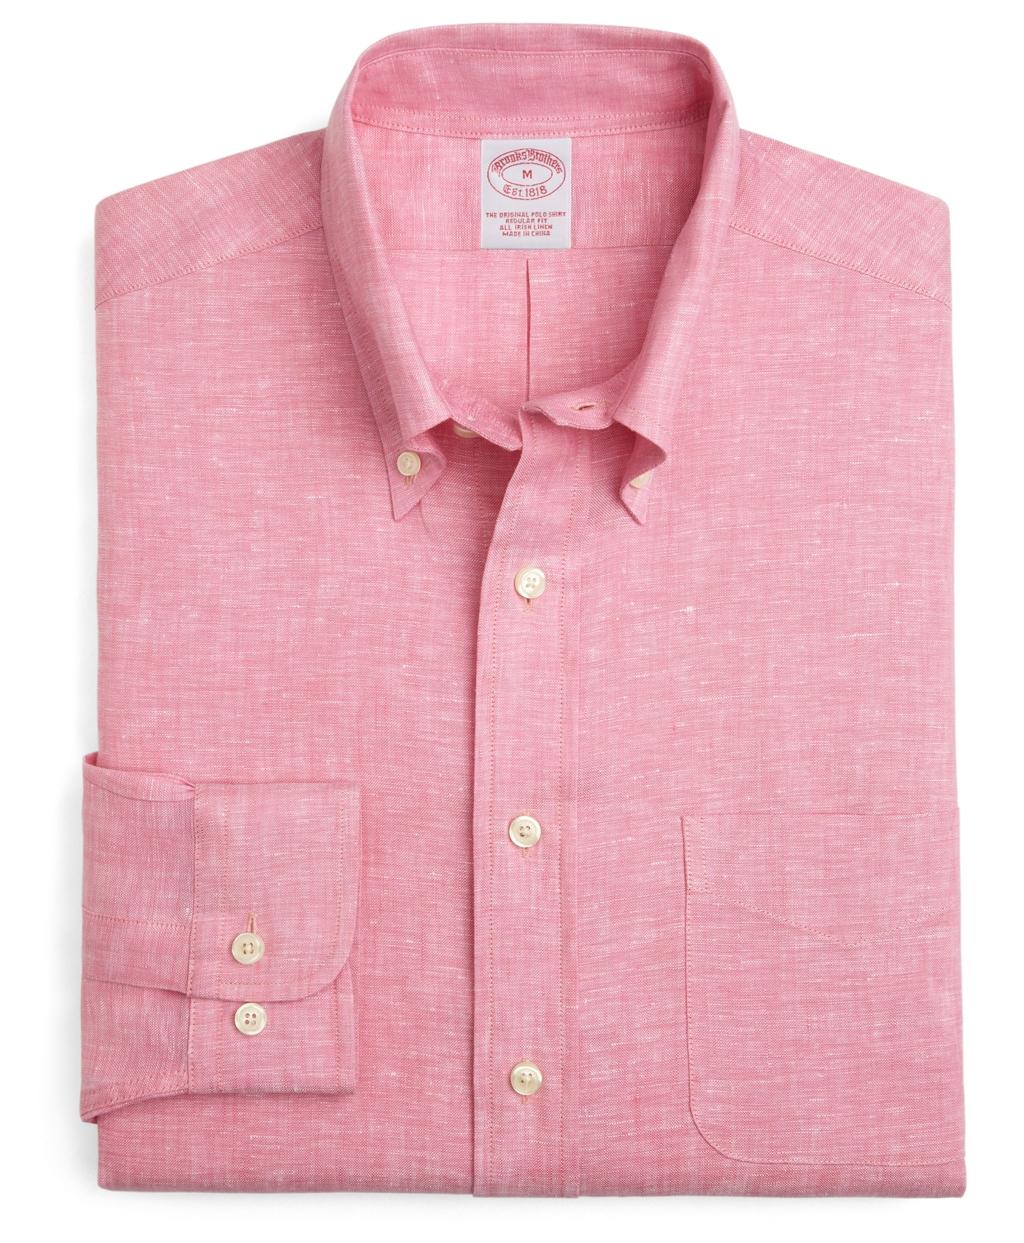 Lyst brooks brothers irish linen regular fit solid sport for Irish linen dress shirts